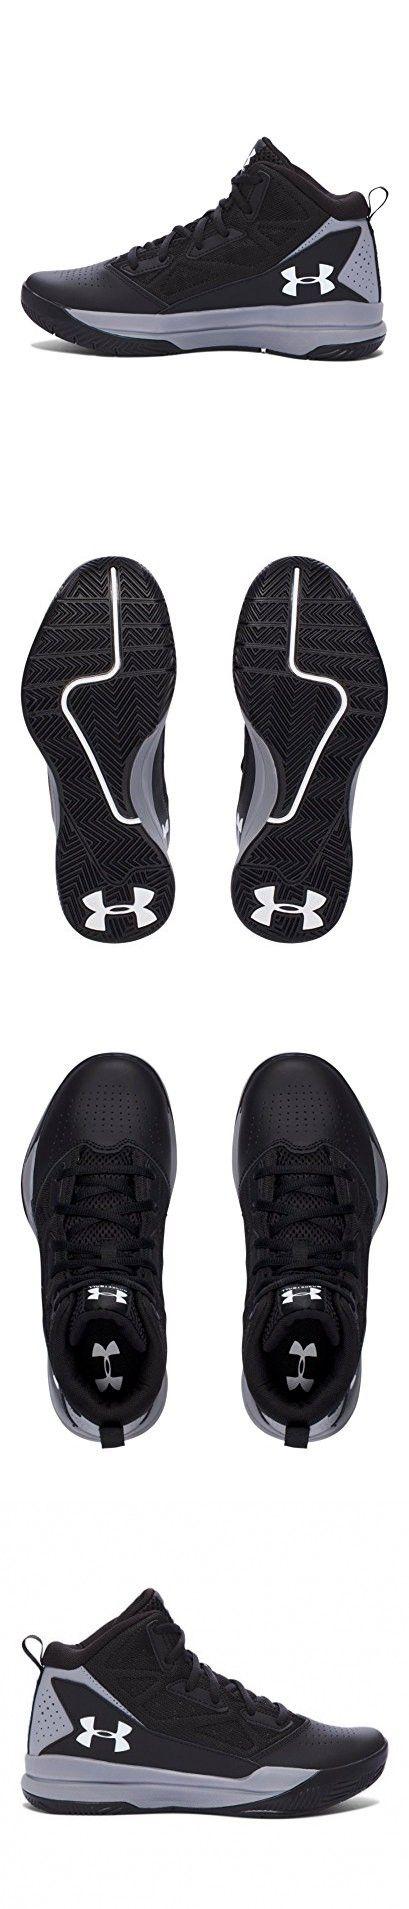 Under Armour Boys' Grade School Jet Mid Basketball Shoes (Big Kid), Black/White, 3.5 M US Big Kid